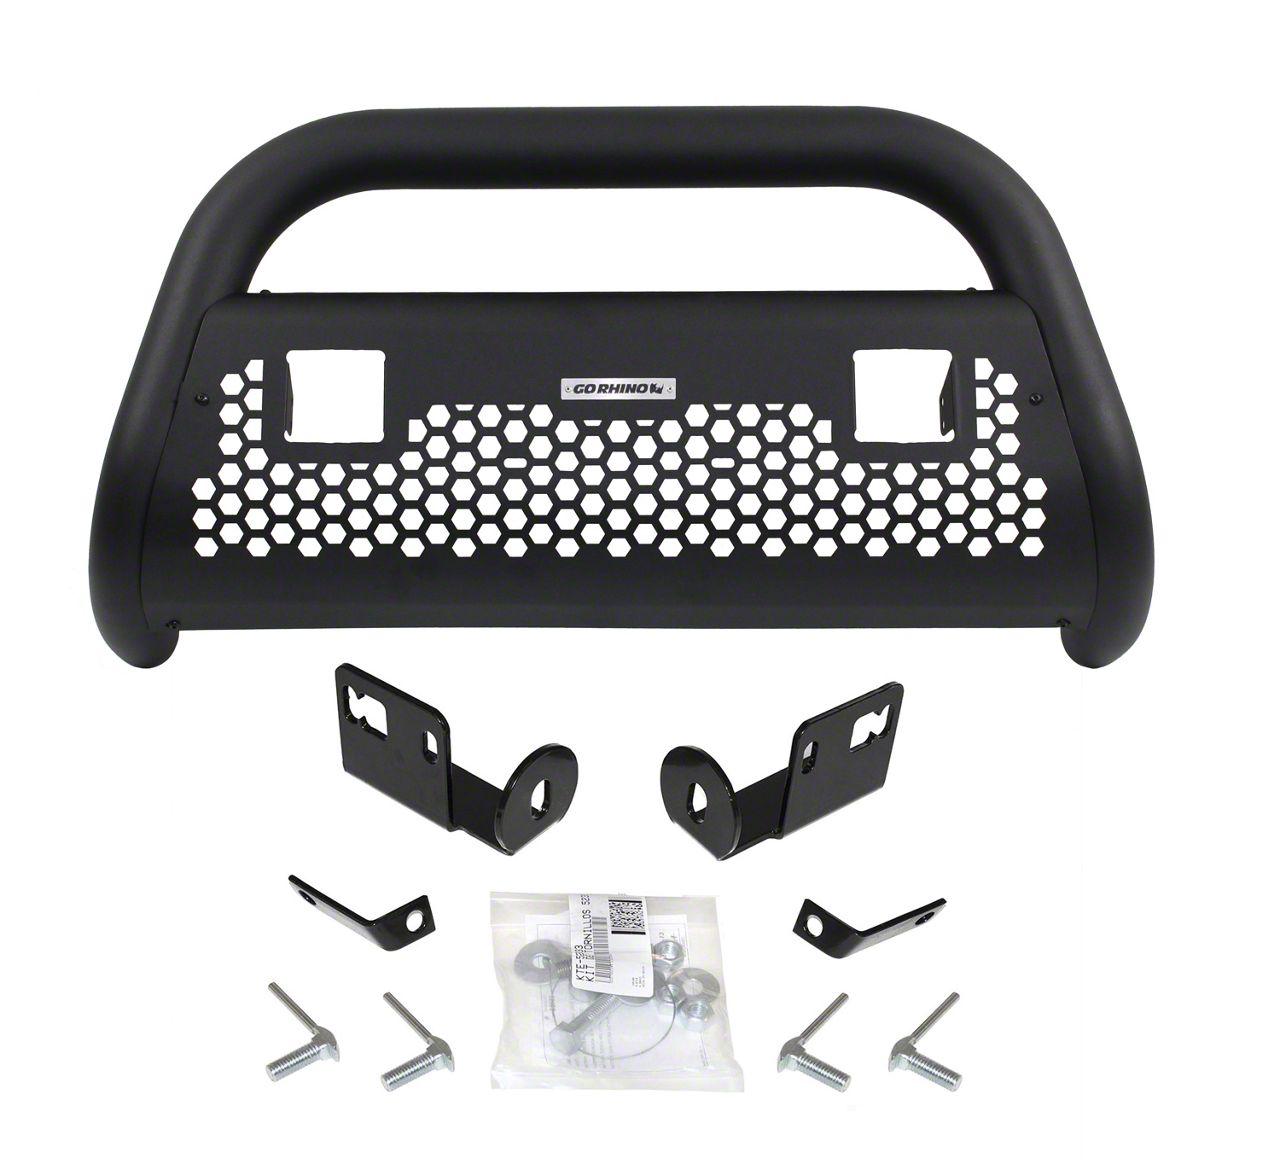 Go Rhino RC2 LR Bull Bar w/ Two LED Cube Light Mounting Brackets - Textured Black (09-18 RAM 1500, Excluding Rebel)